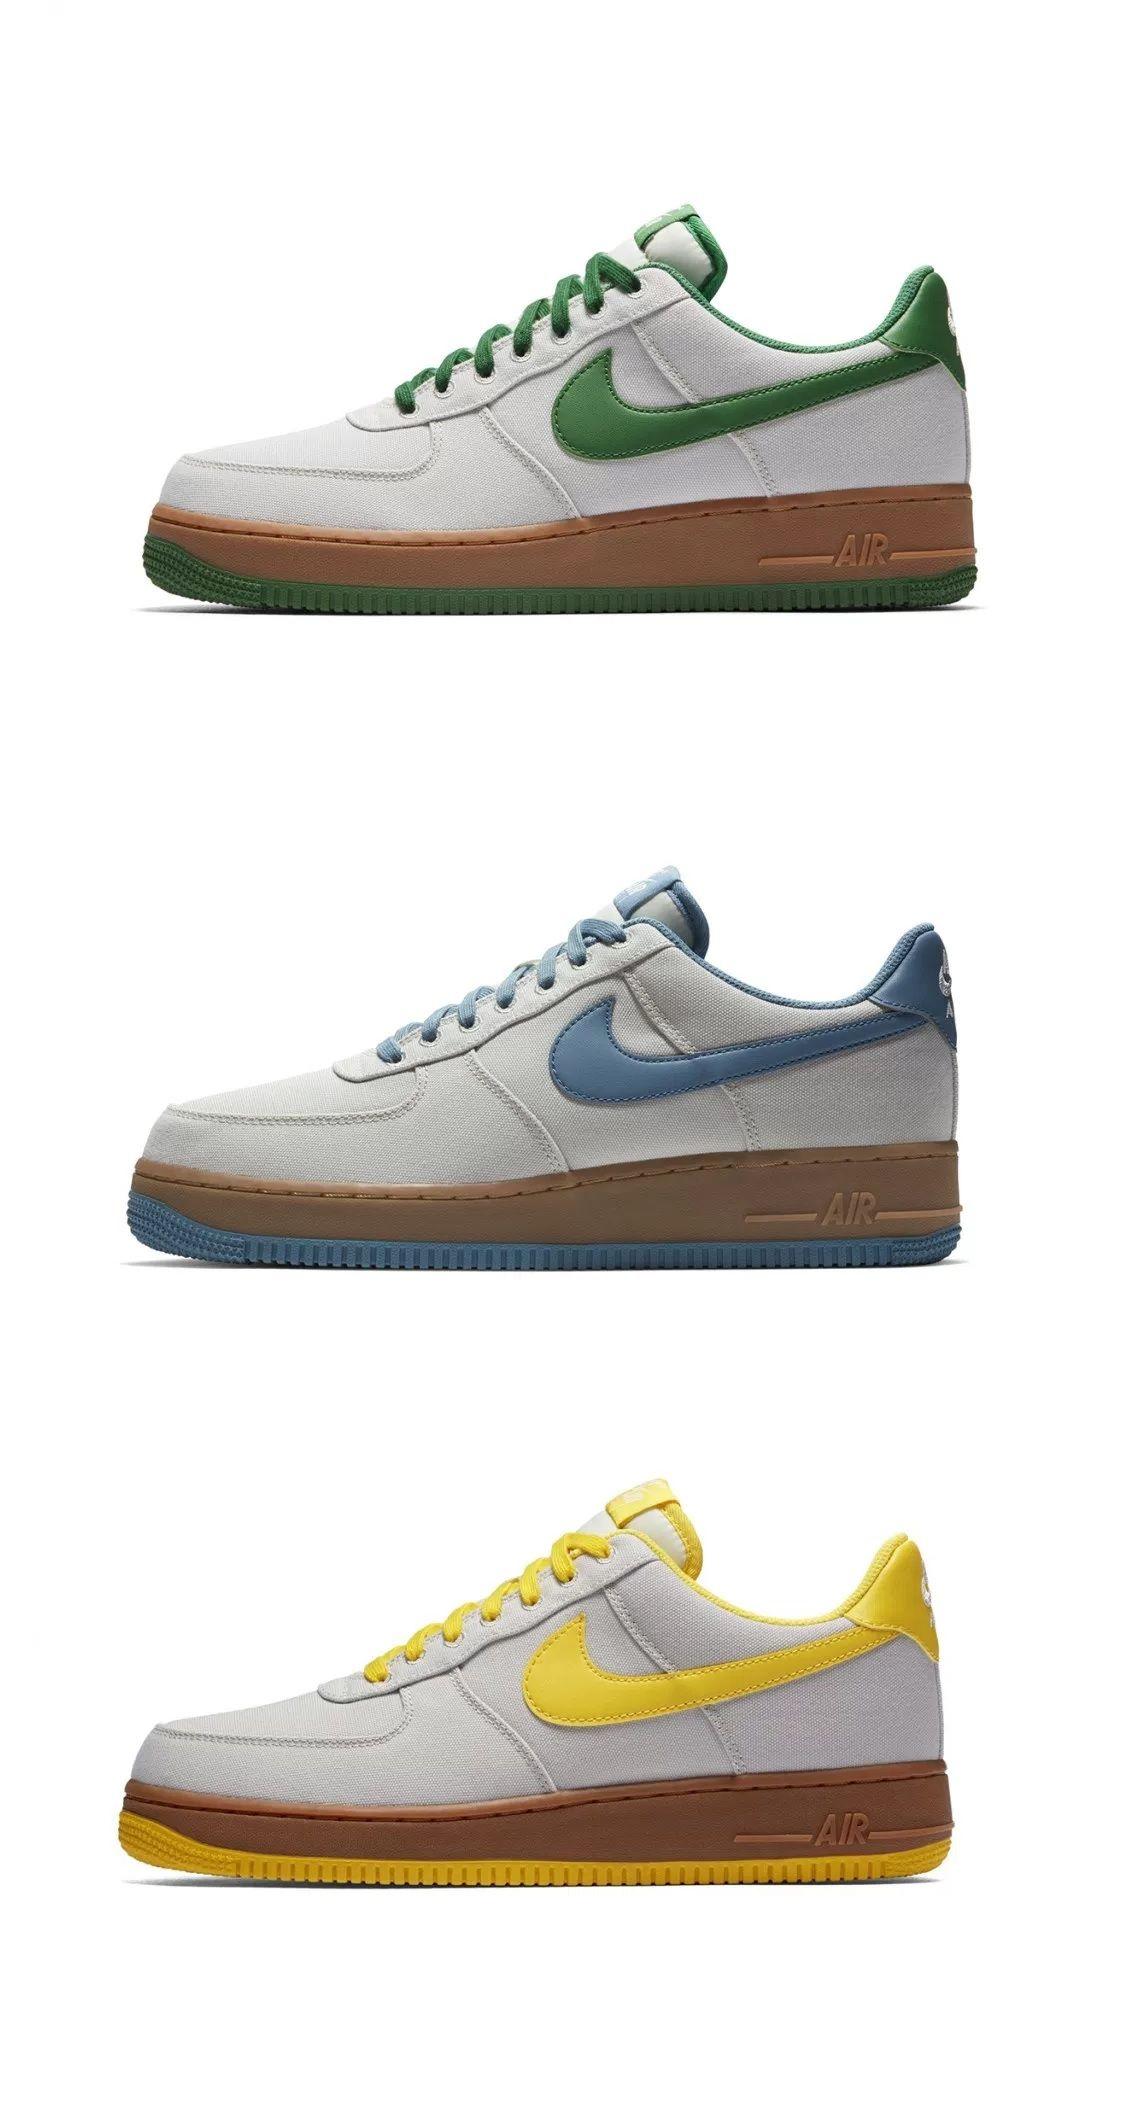 Nike Air Force 1 CanvasGum | Sneakers | Zapatillas nike